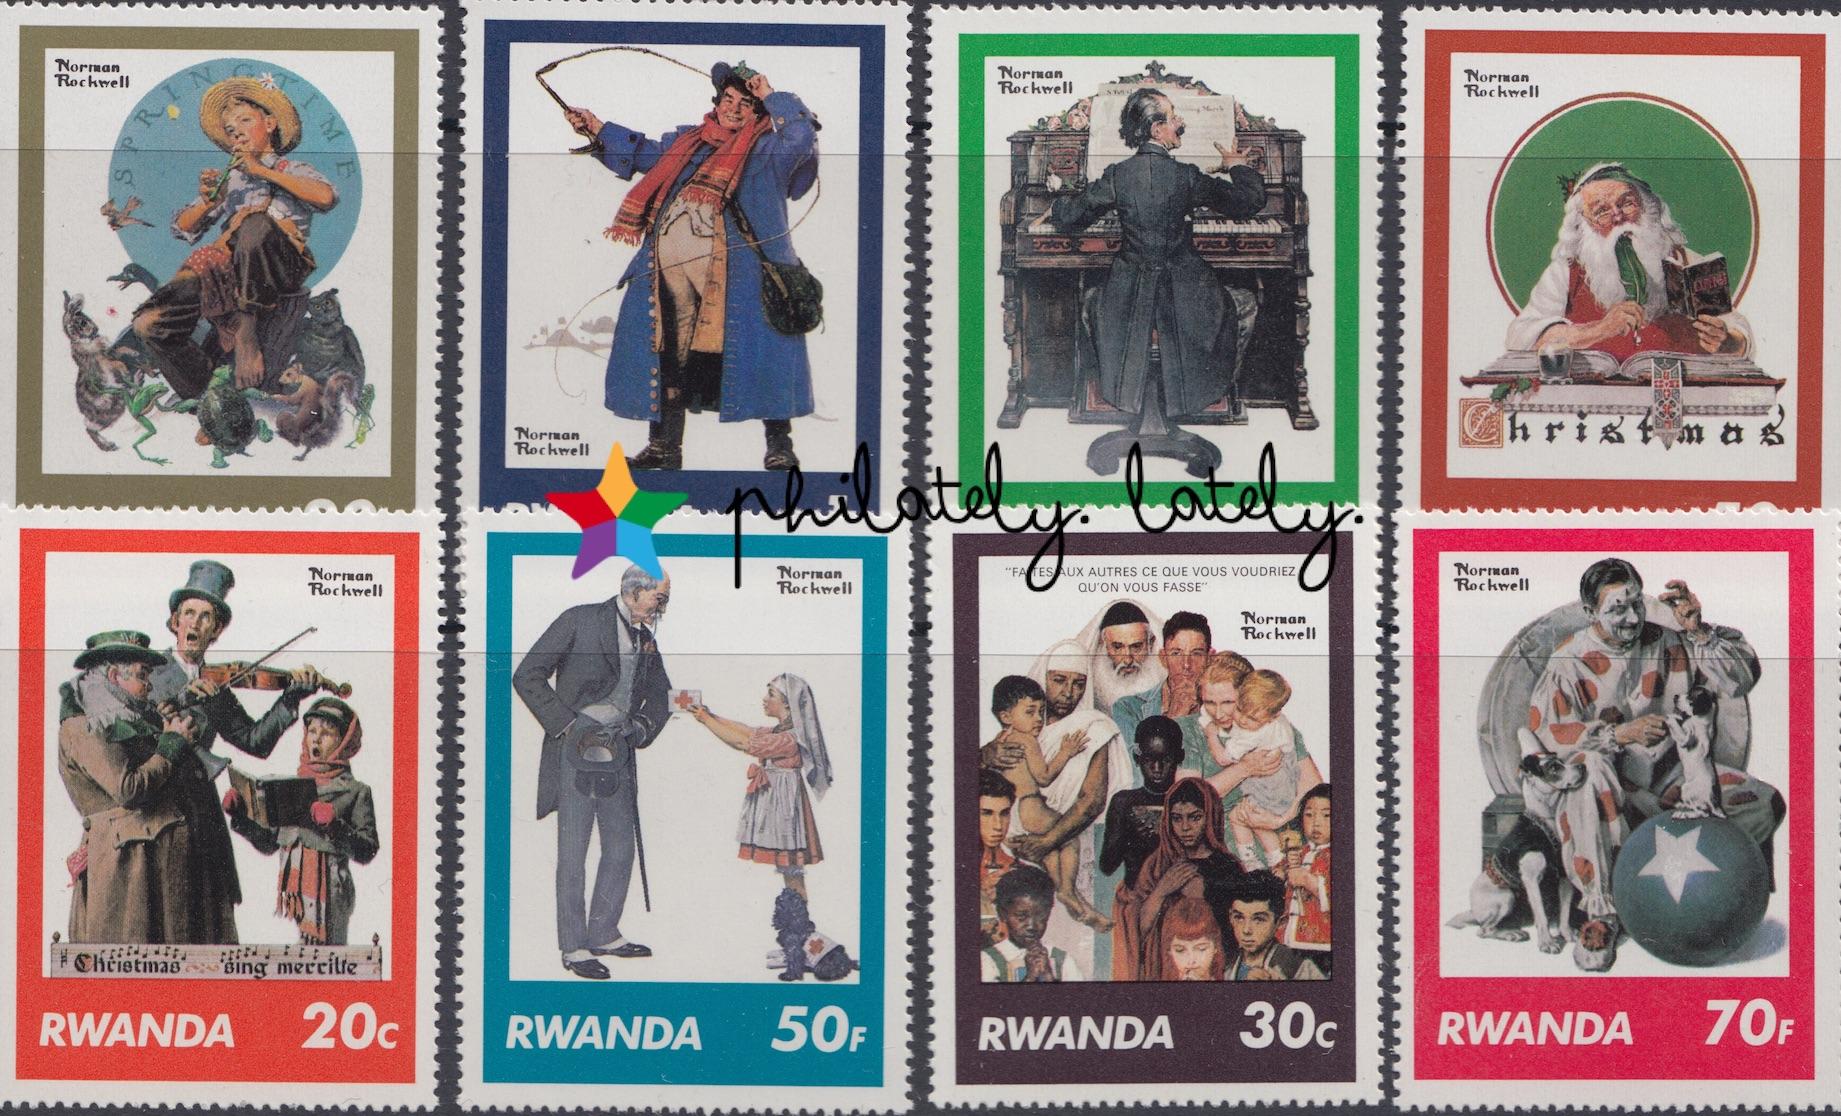 001_NORMAN_ROCKWELL_STAMPS_RWANDA